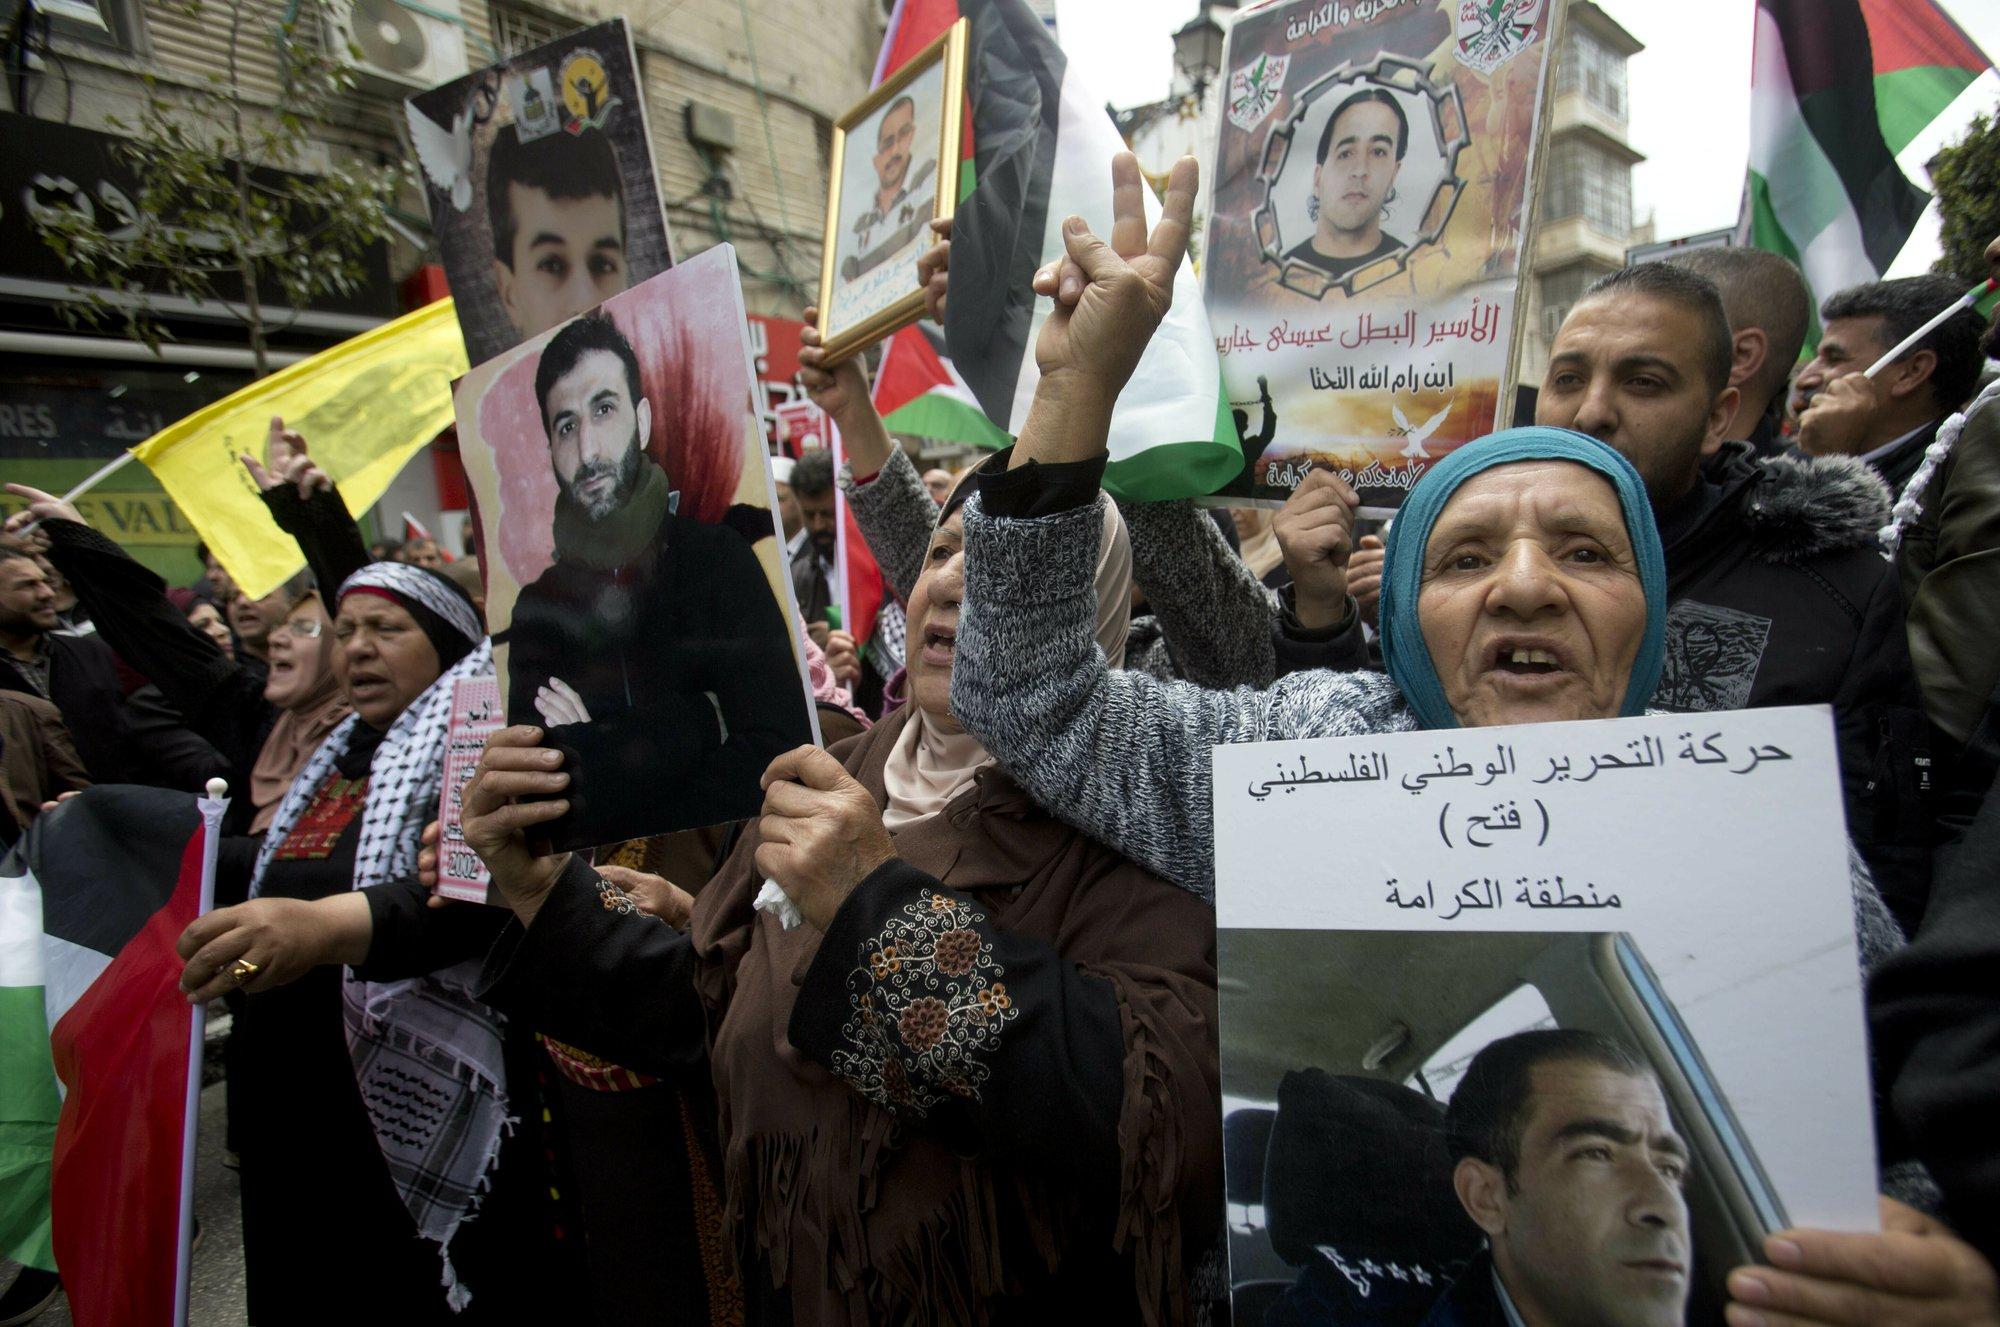 Israeli envoy: no action on West Bank until after peace plan